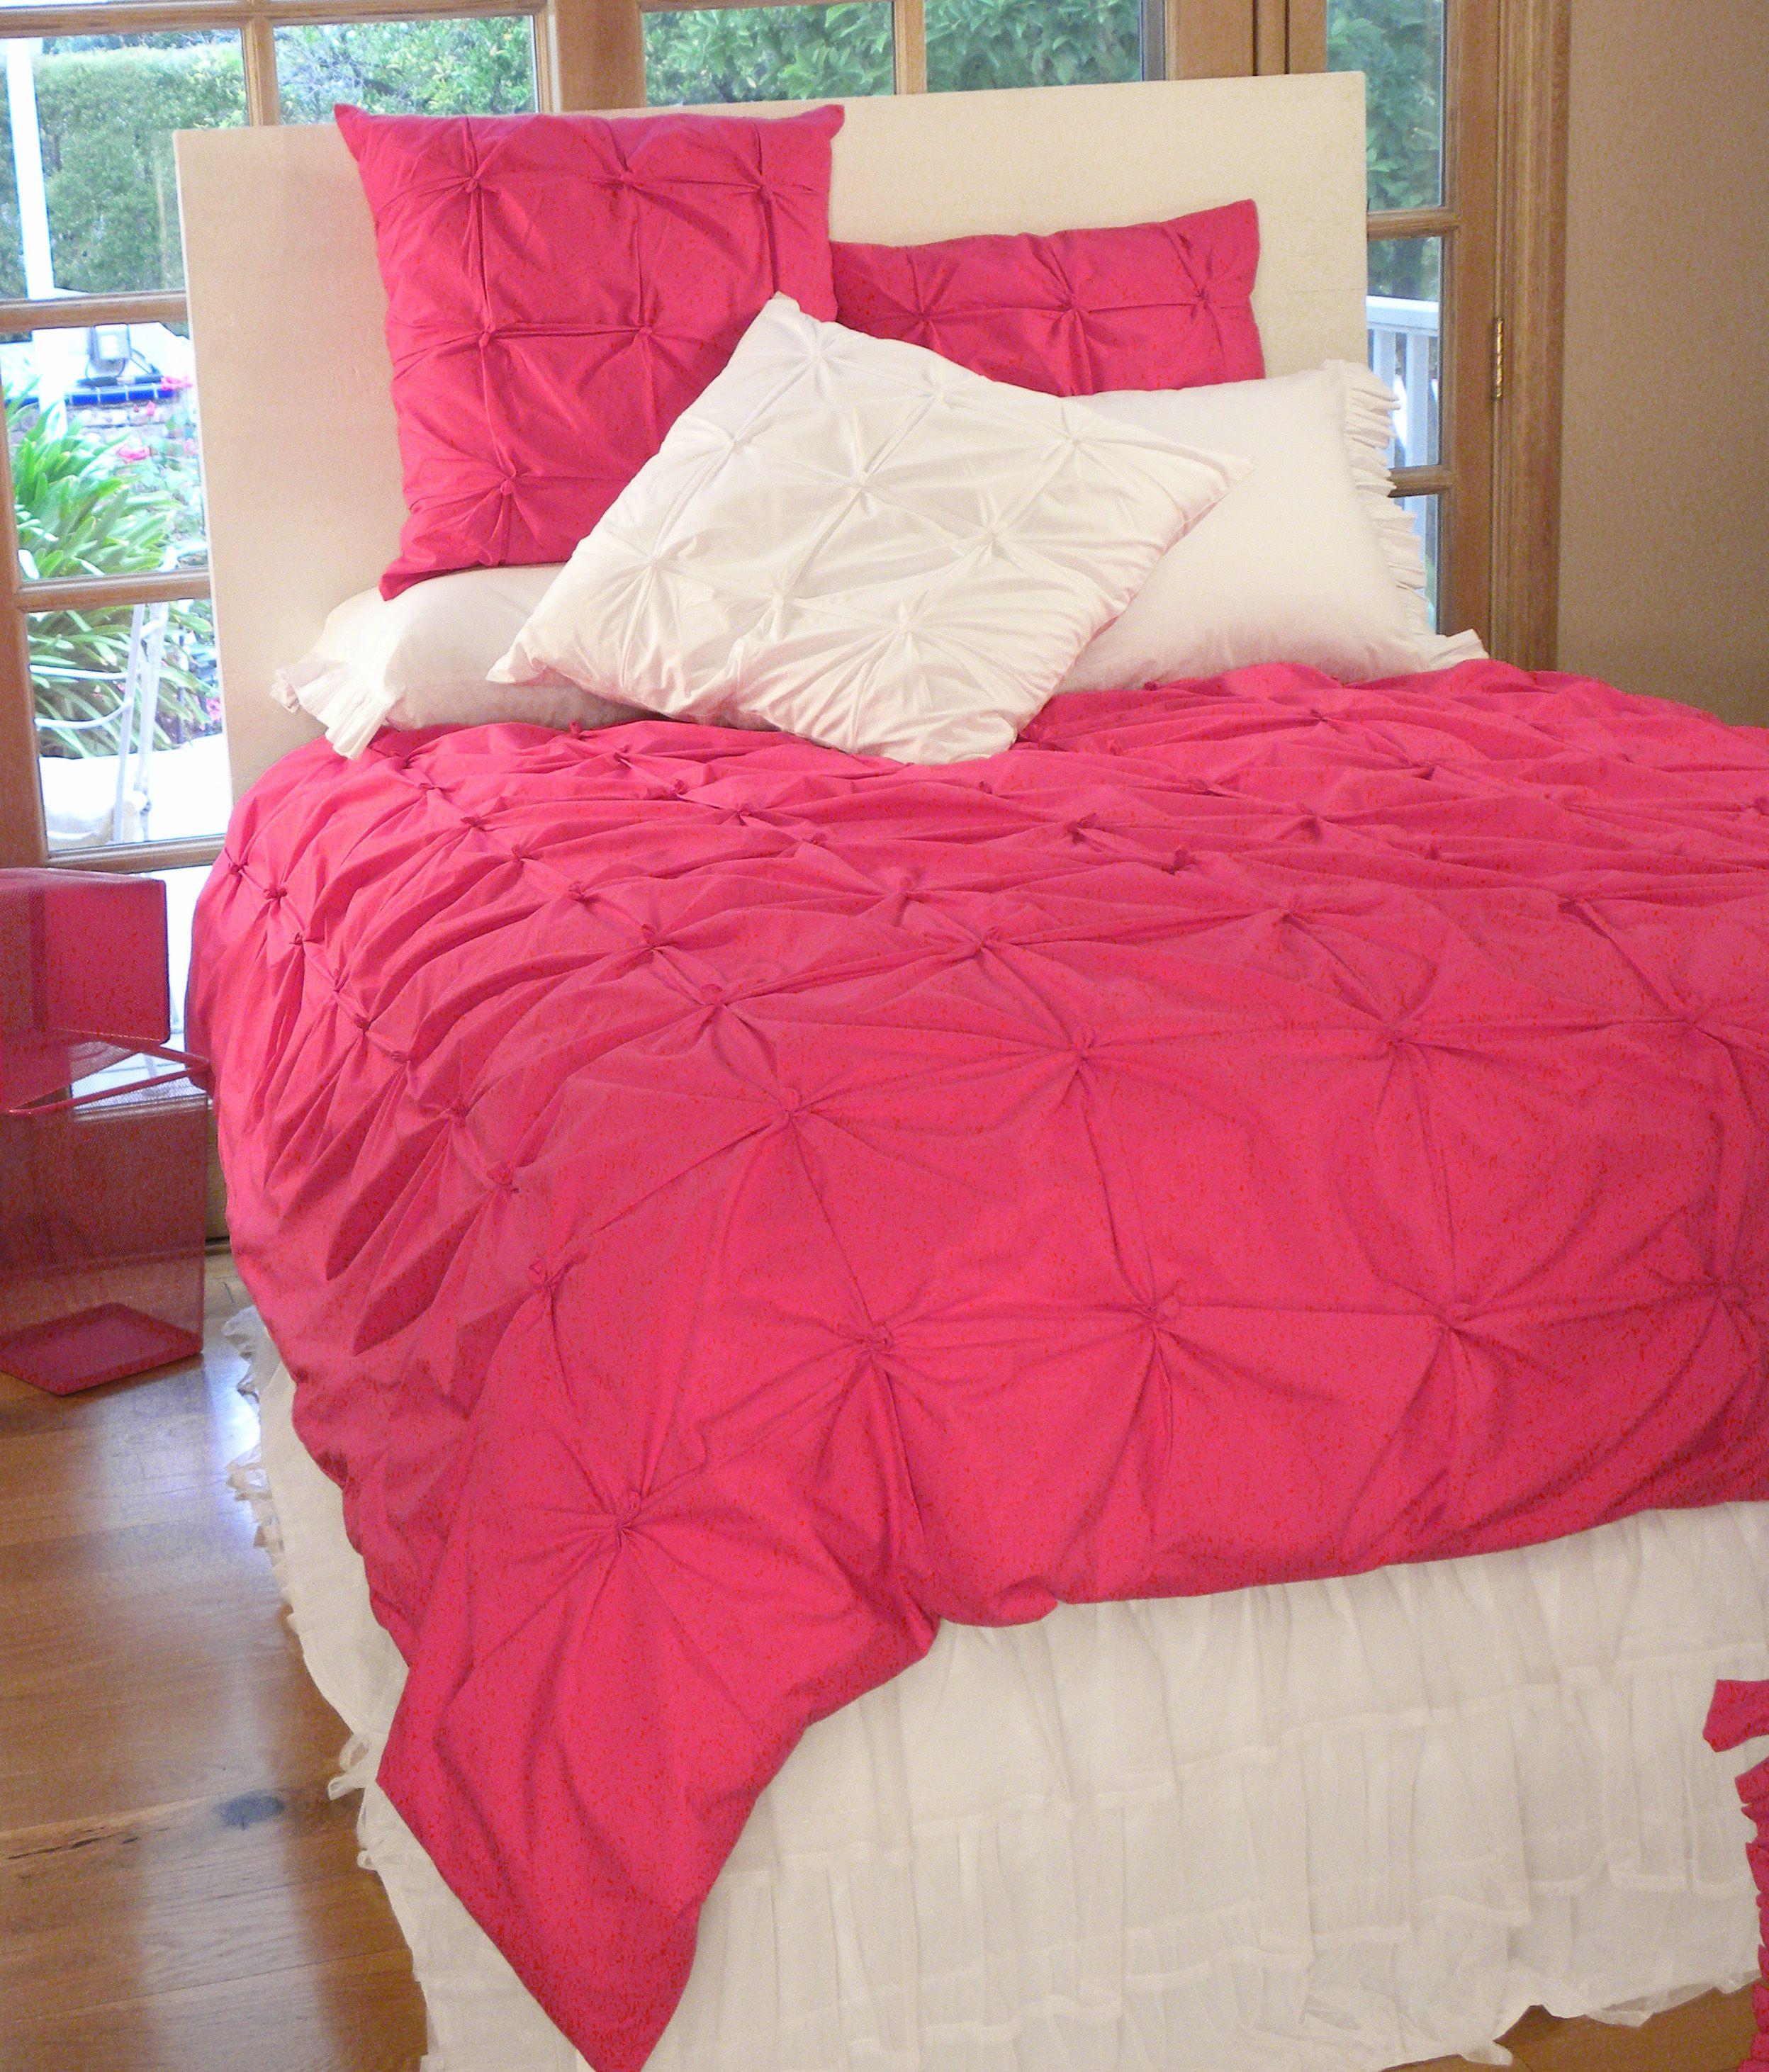 Girls Bedding Crisp Hot Pink Hot Pink Bedding Girls Pink